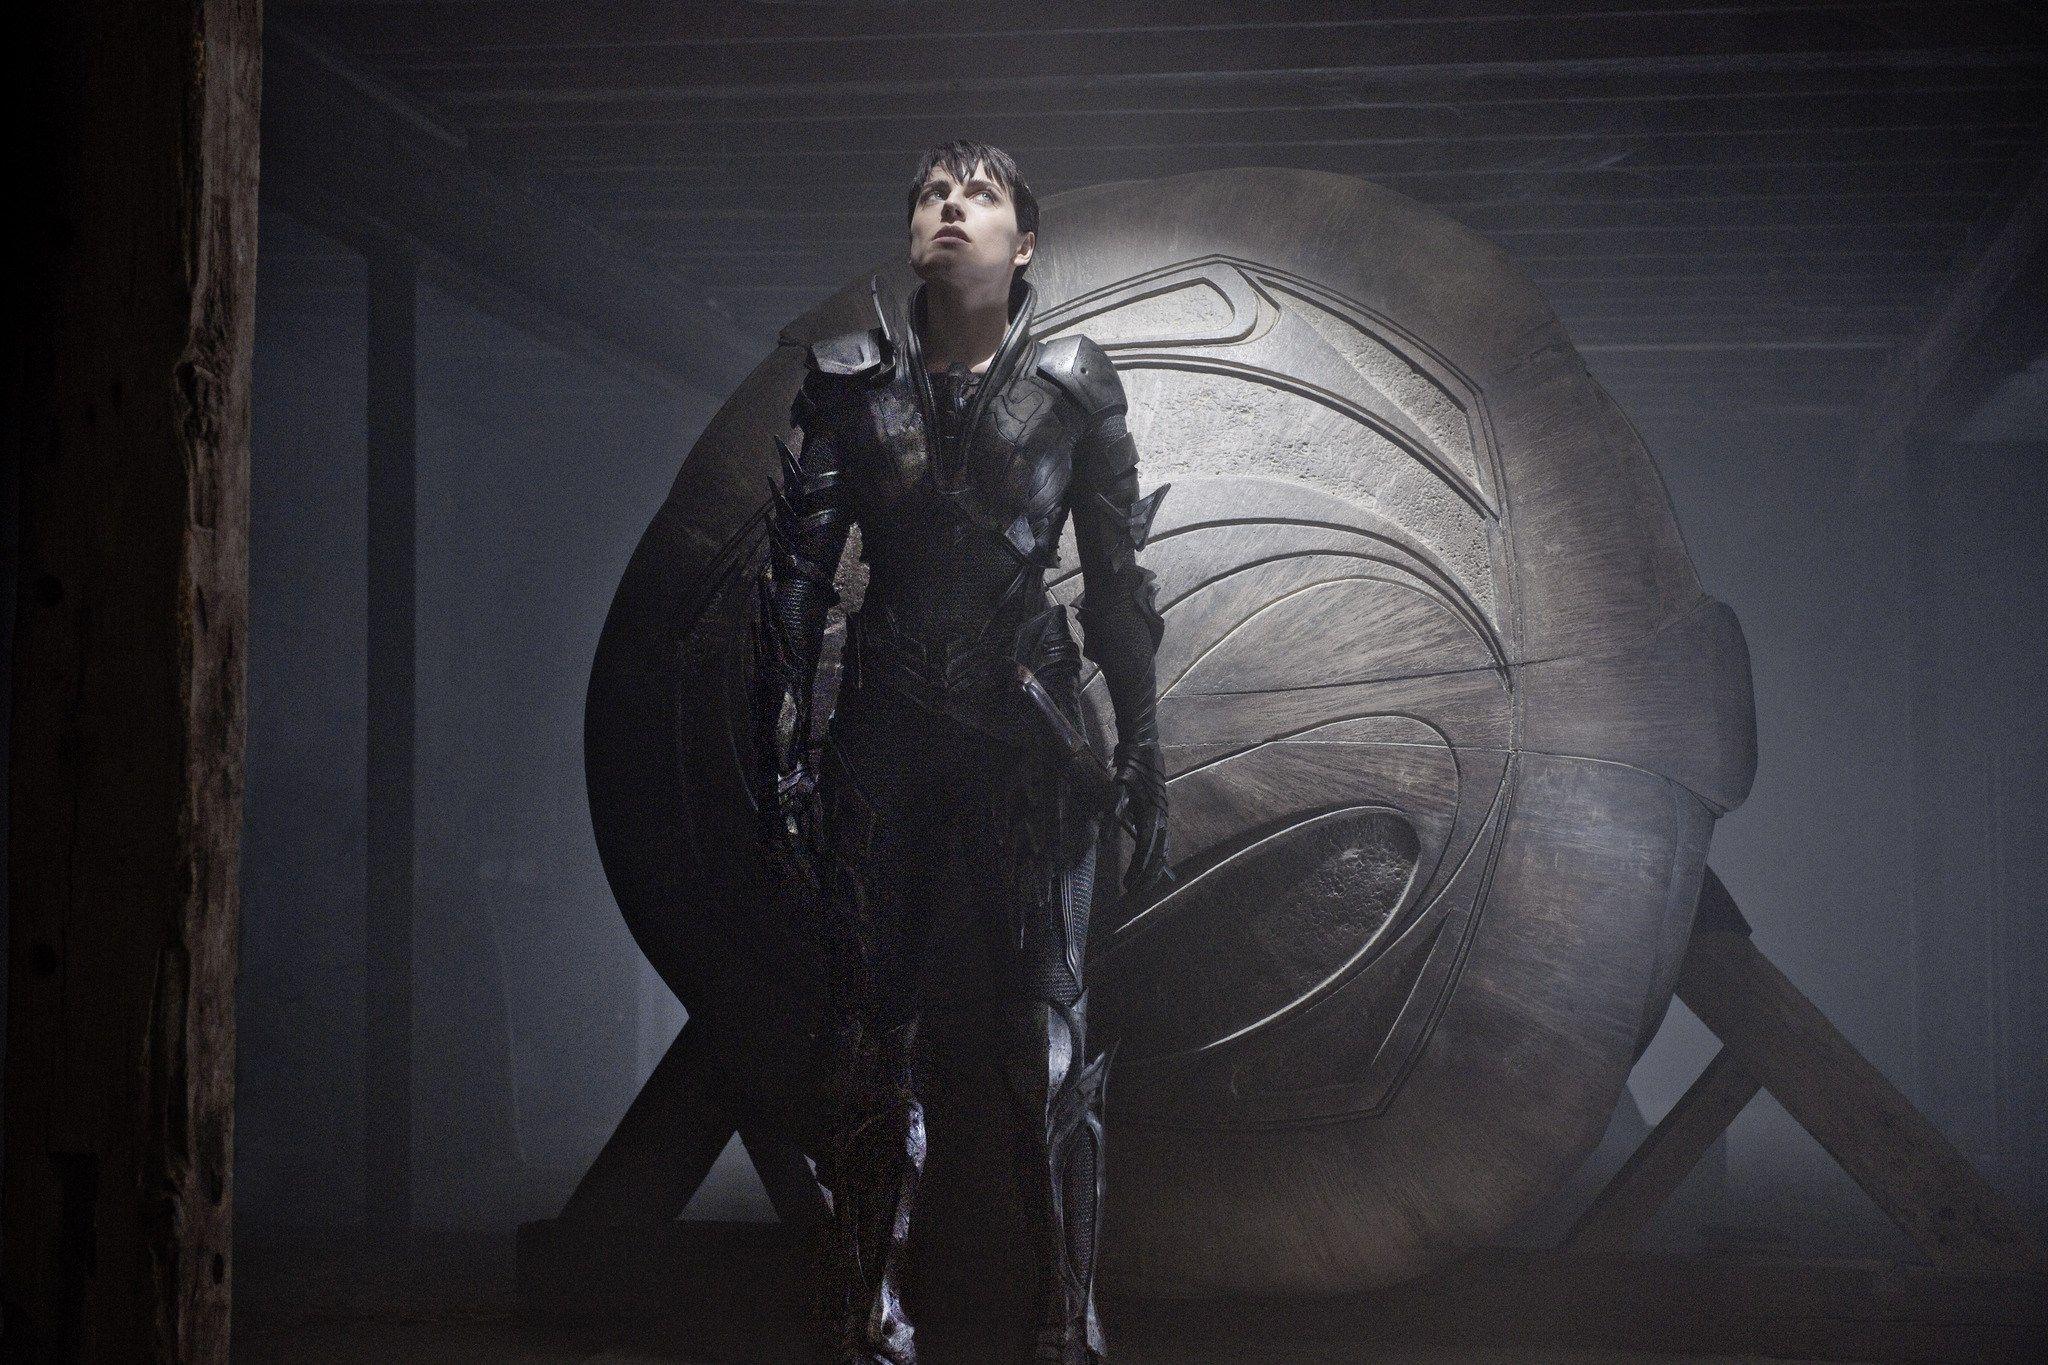 avengers hd wallpapers 1080p high quality o oshka pinterest